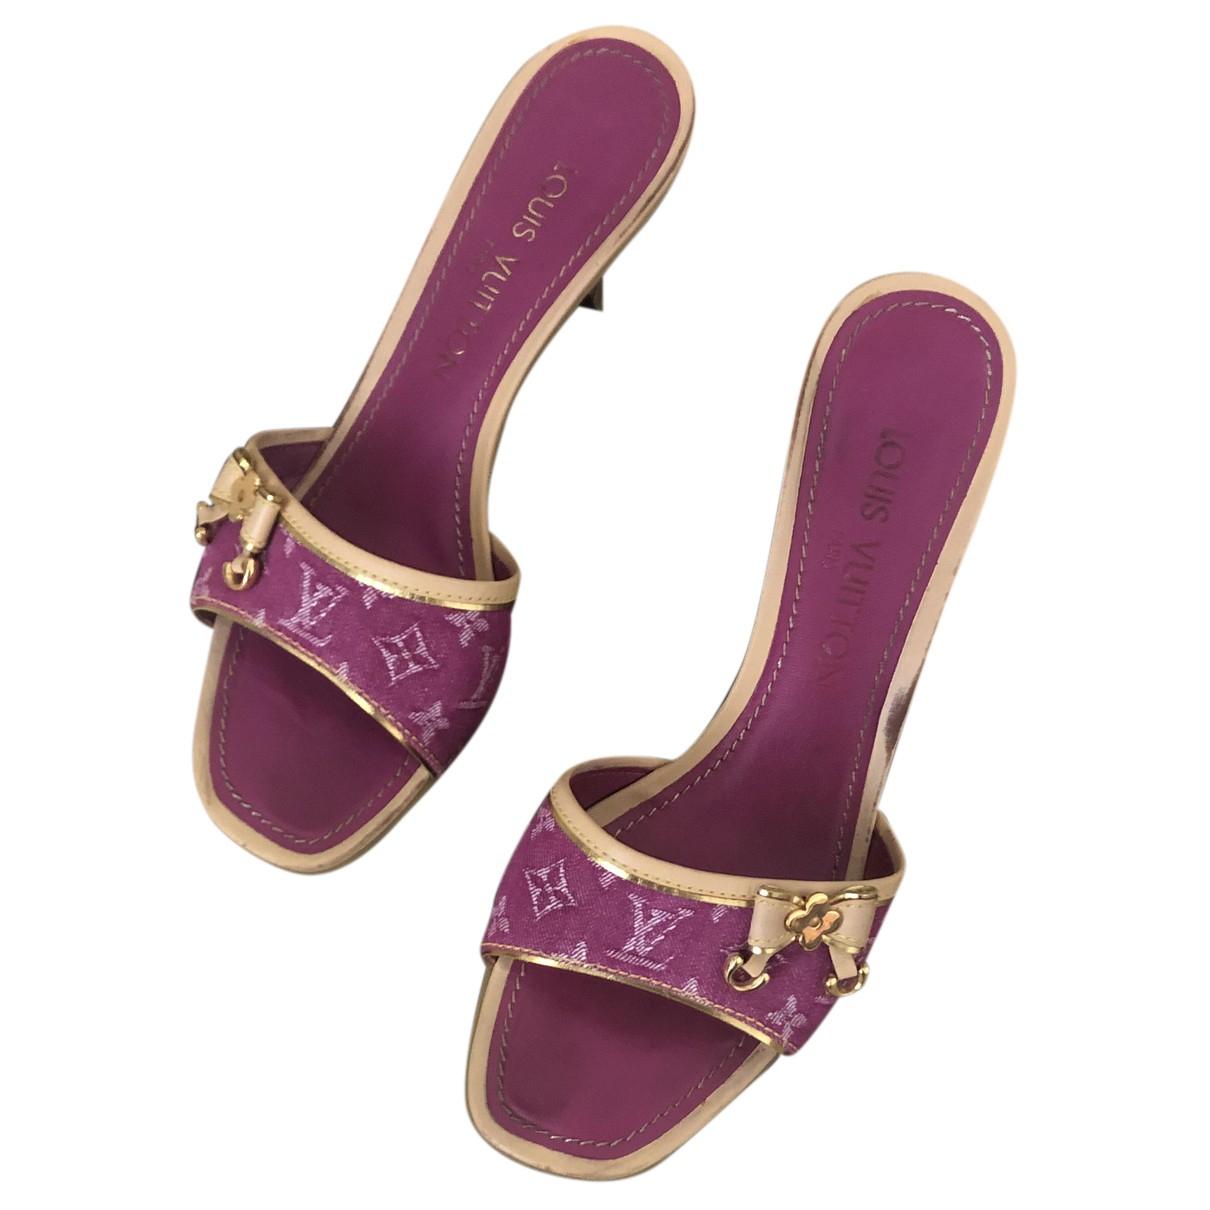 Louis Vuitton N Pink Cloth Sandals for Women 37 EU